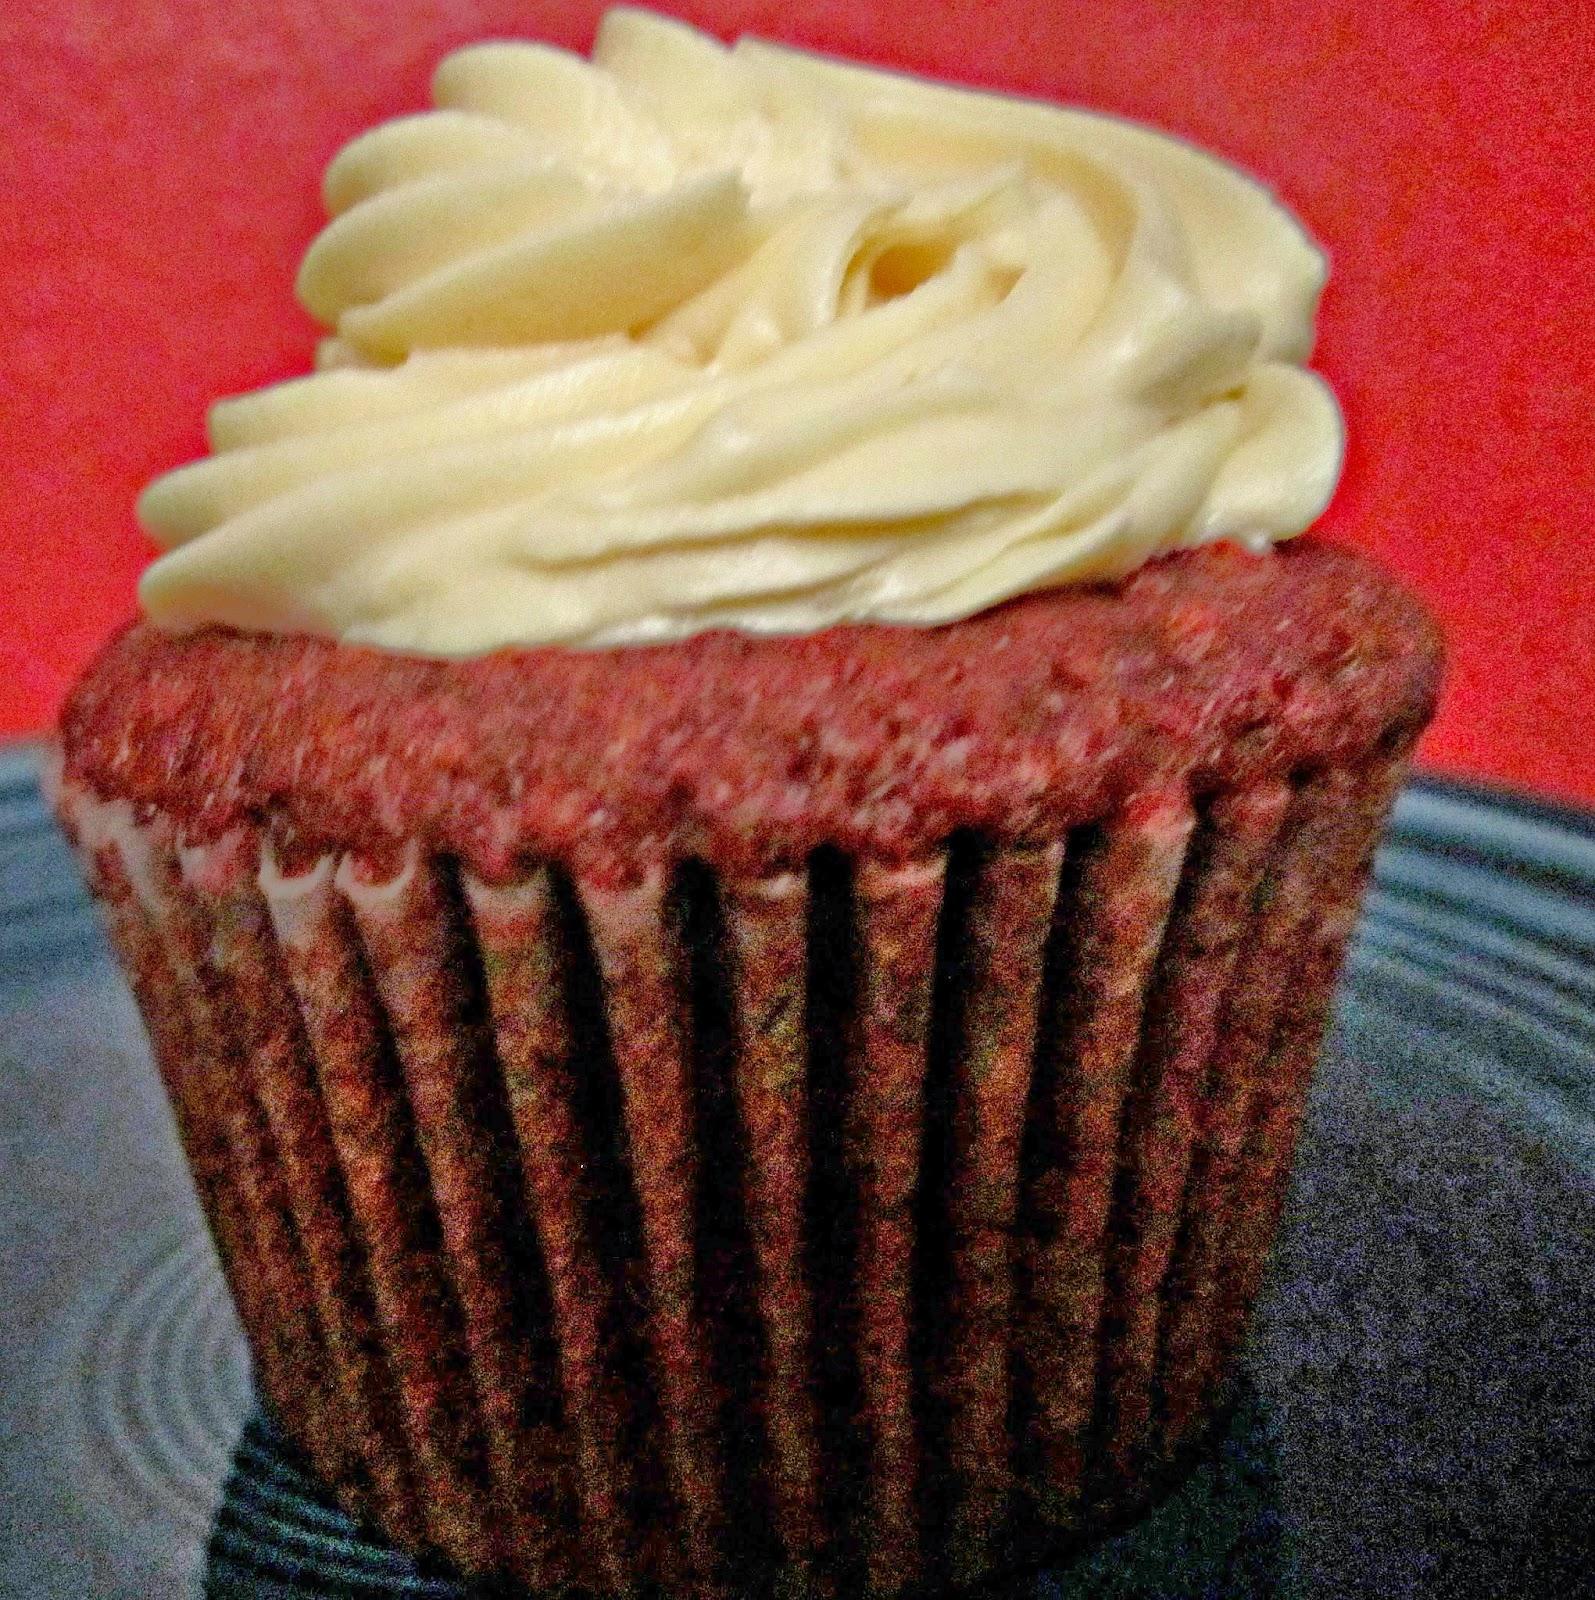 The Dessert Tray review, Red Velvet Cupcake and Poppyseed Cake